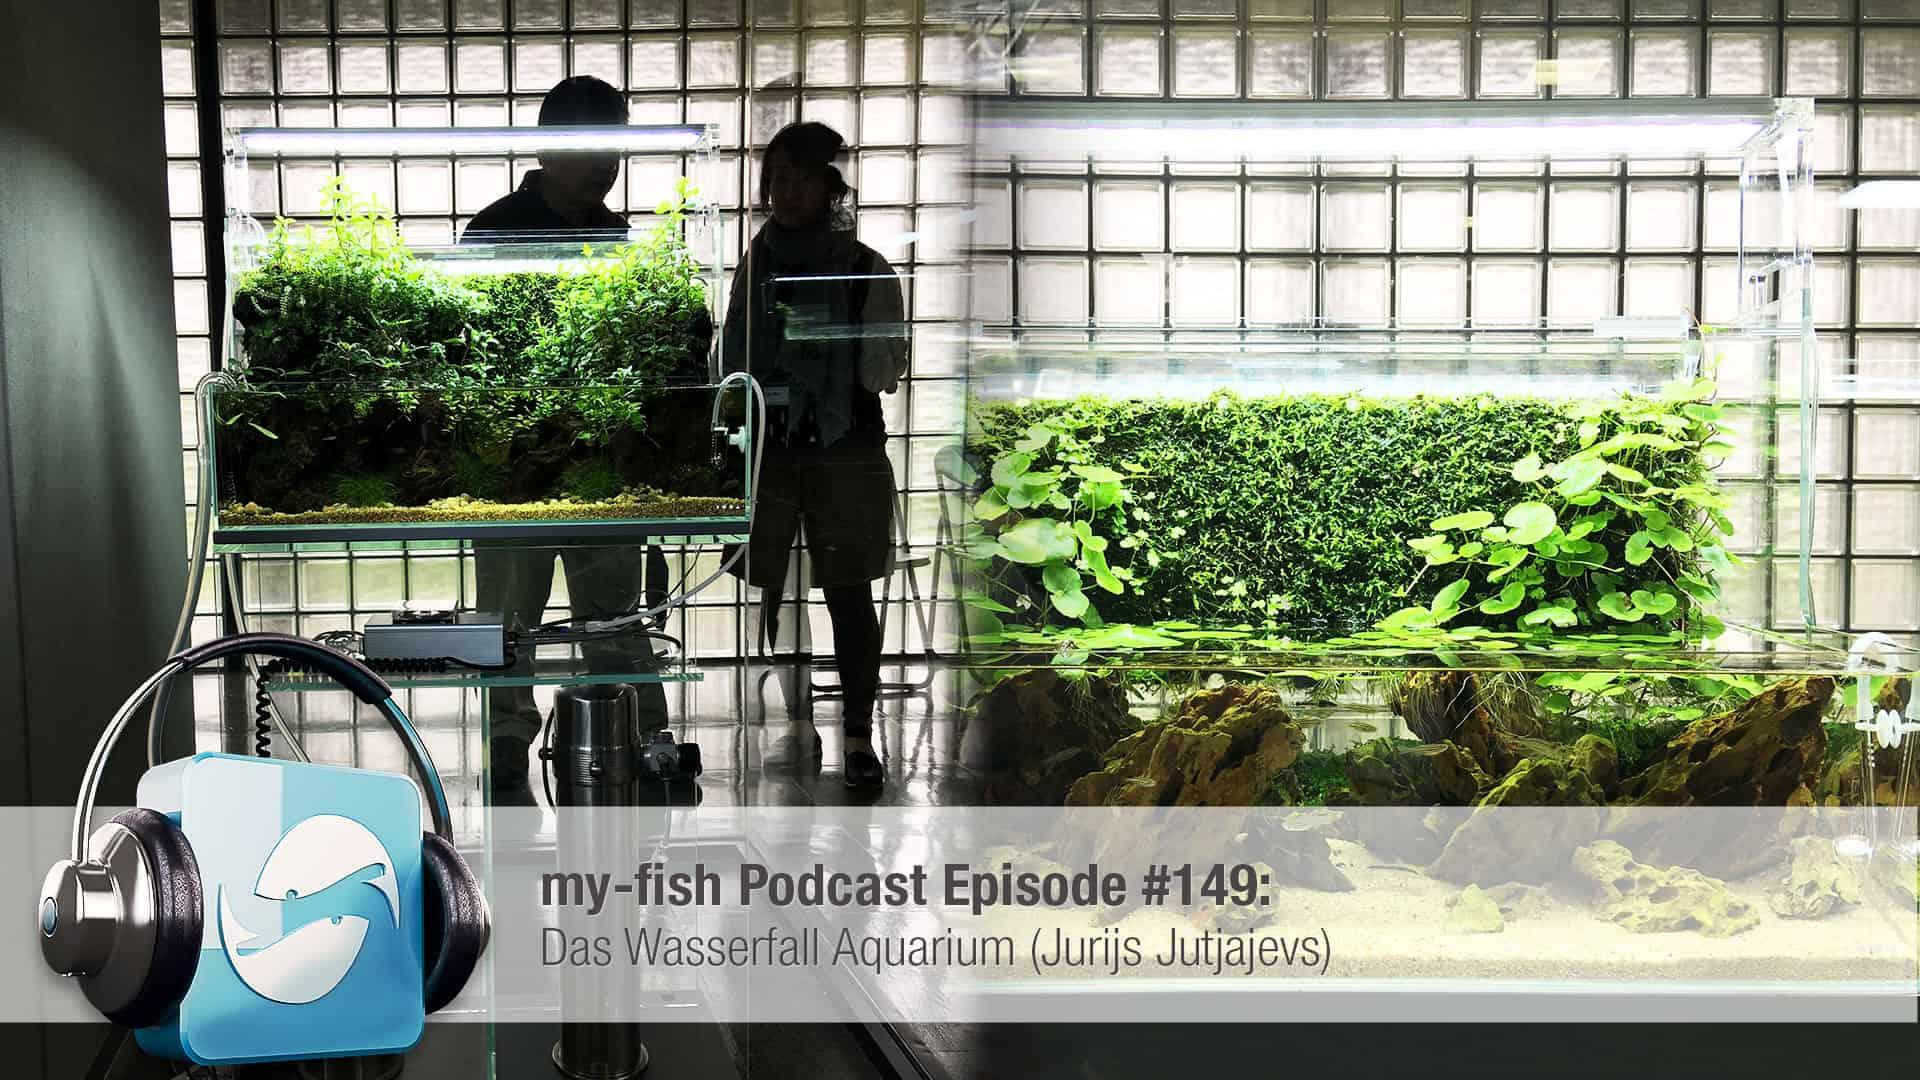 Podcast Episode #149: Das Wasserfall Aquarium (Jurijs Jutjajevs) 1